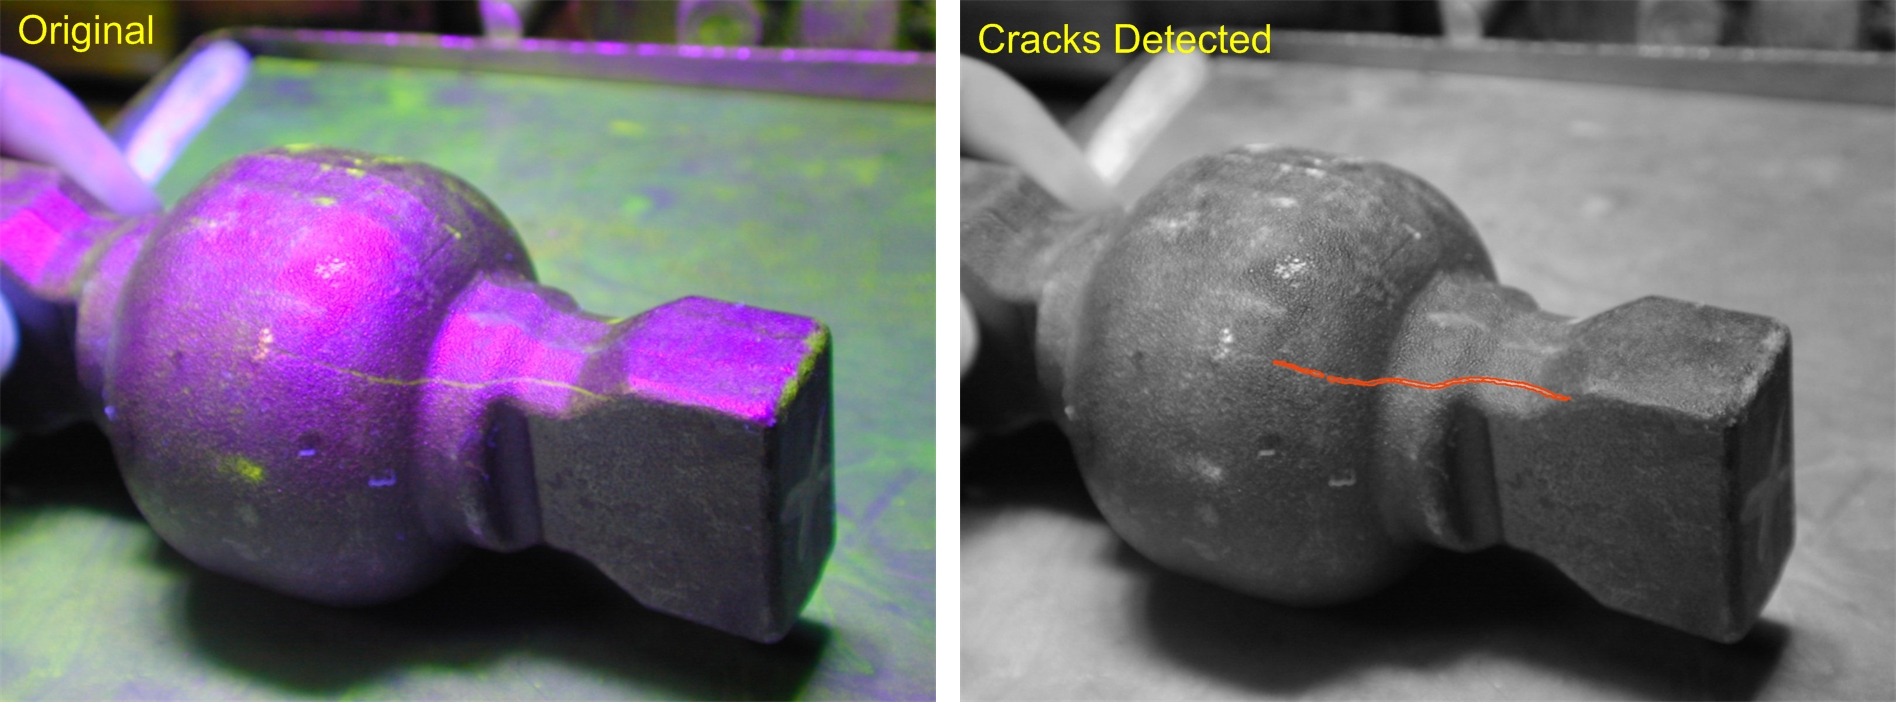 crack testing methods